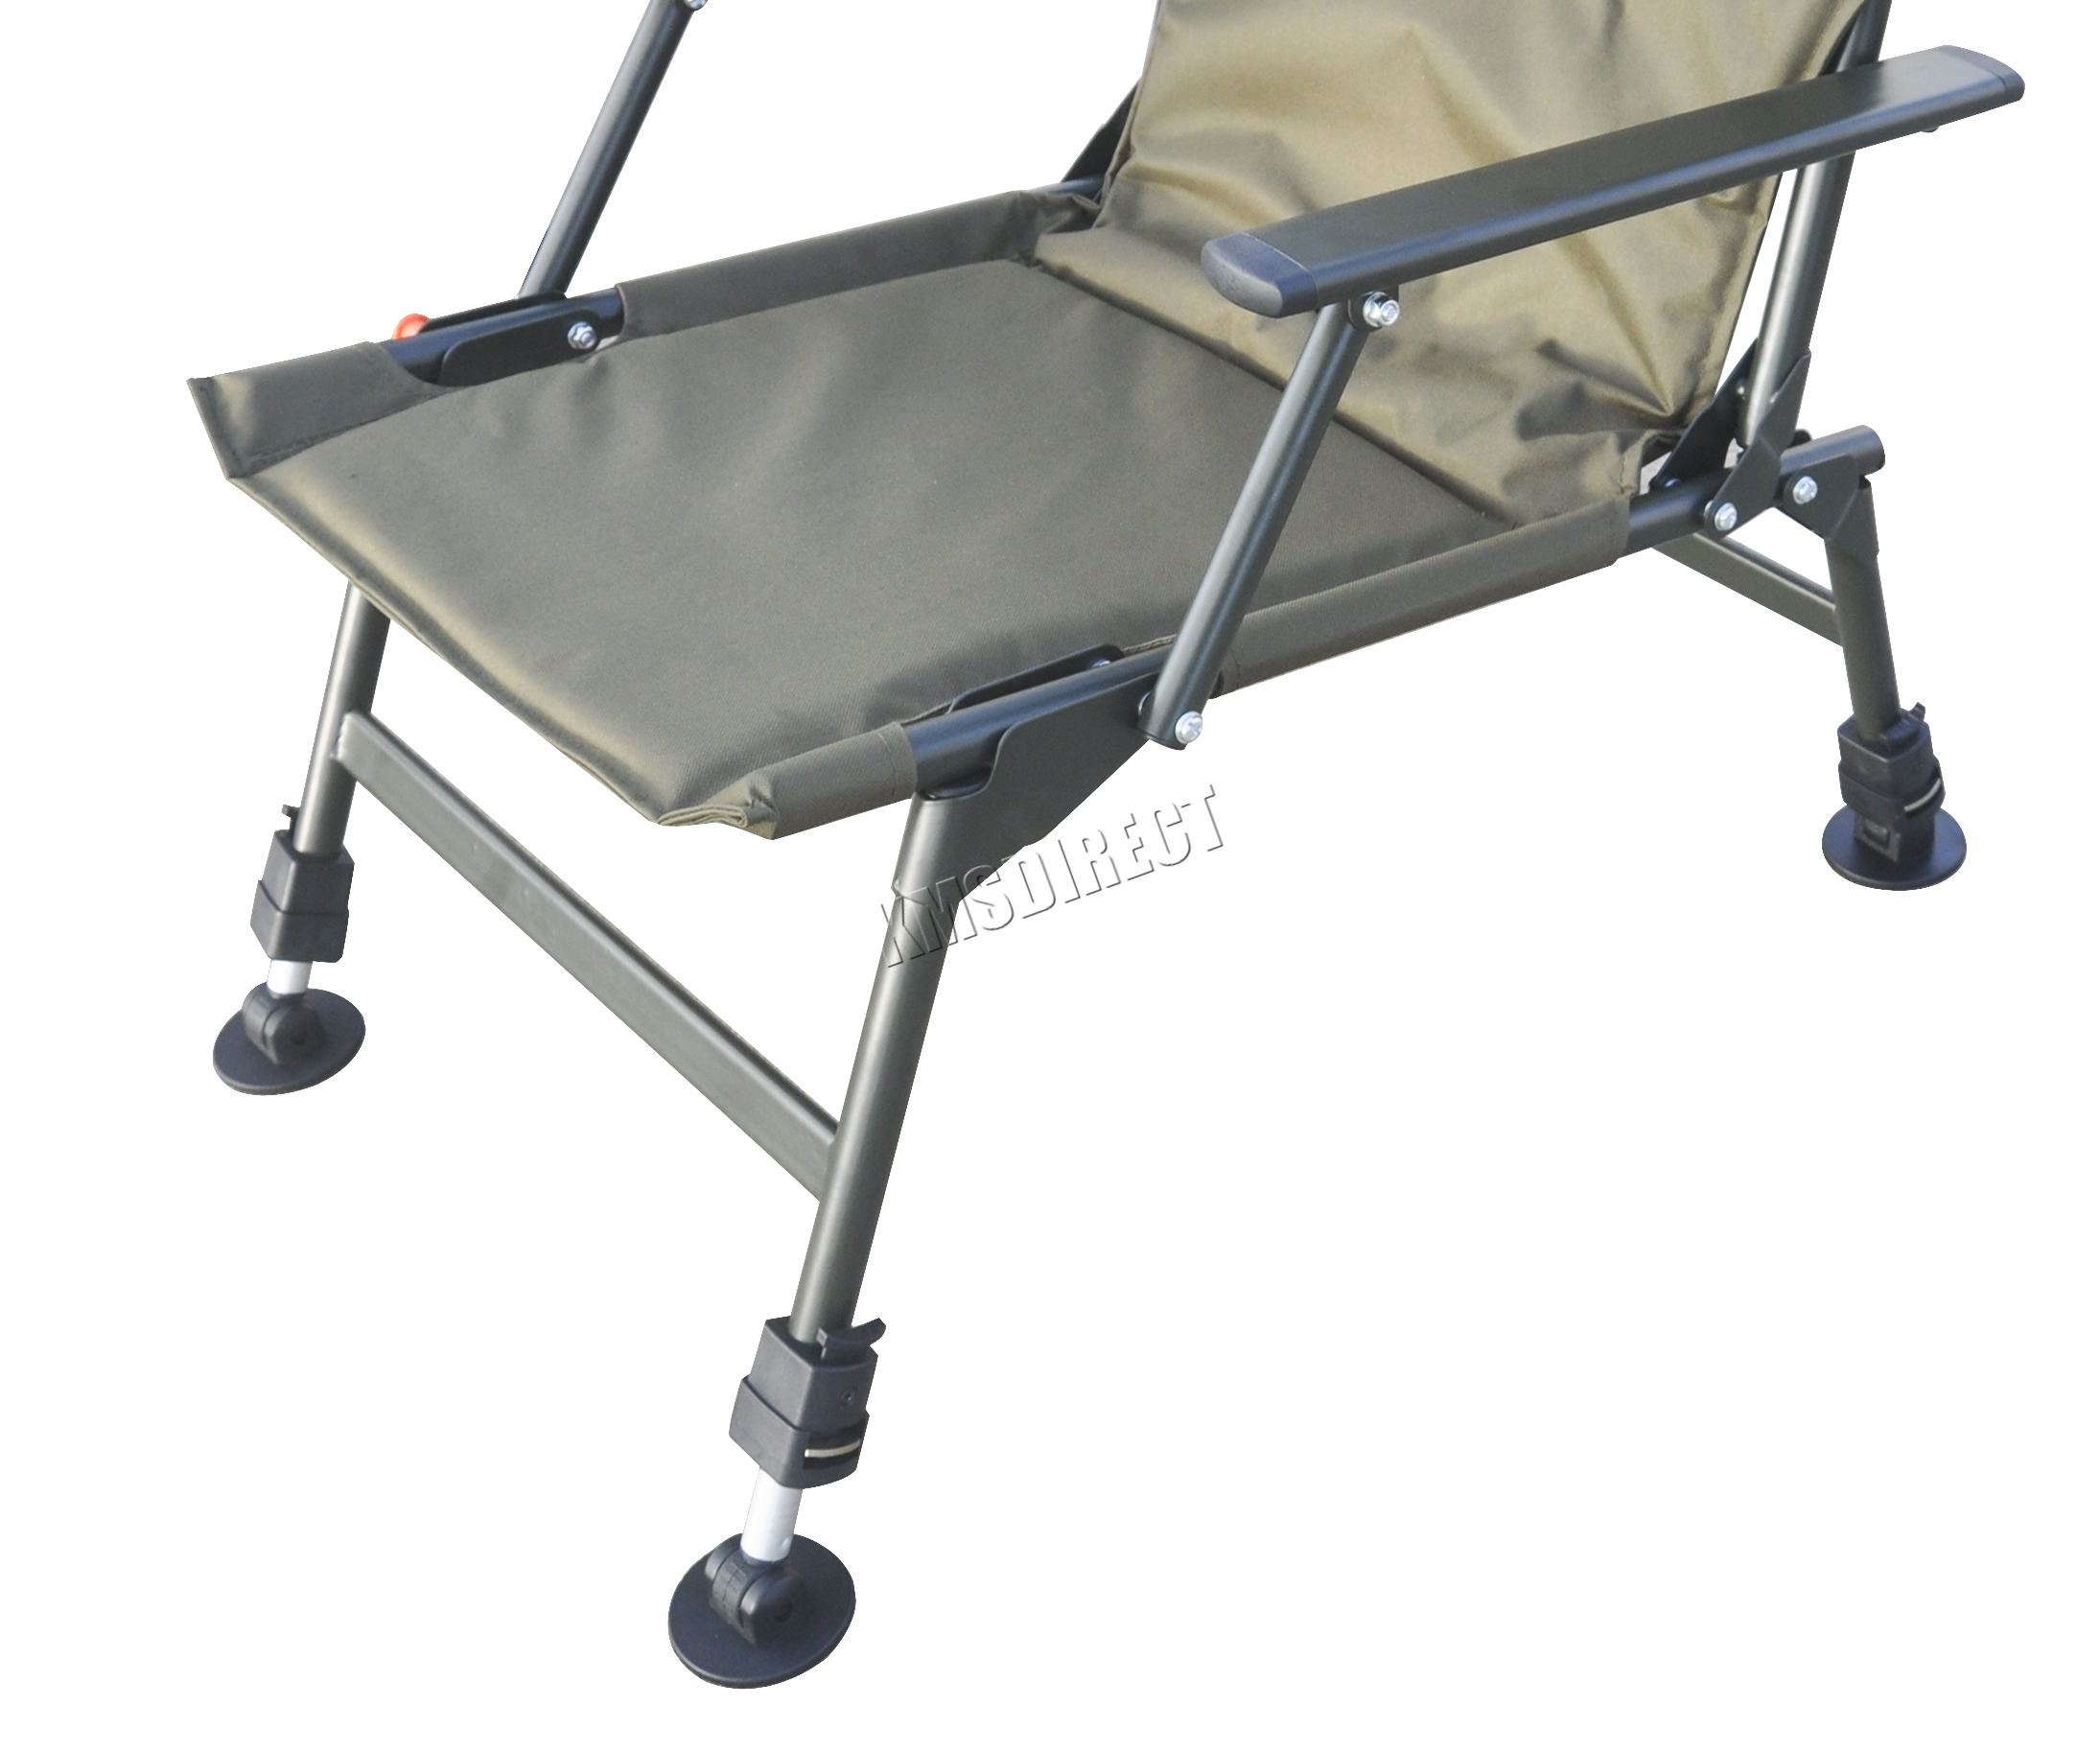 folding chair legs salon chairs portable carp fishing camping heavy duty 4